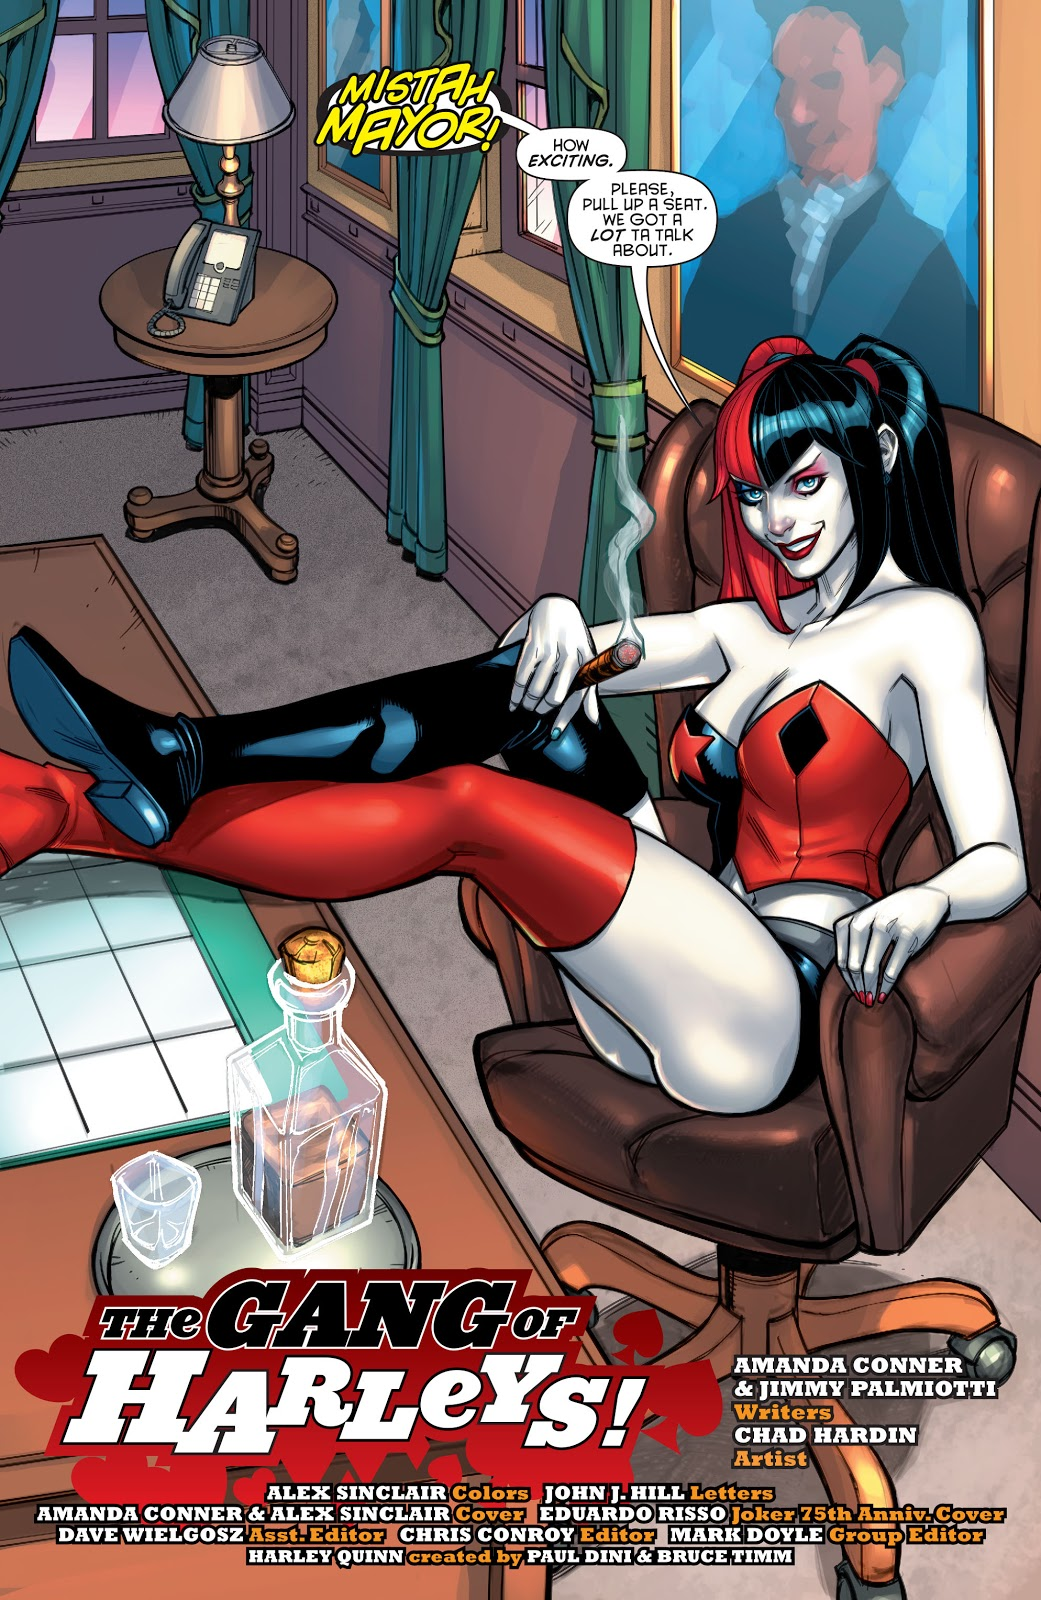 Harley Quinn Vol. 2 #17